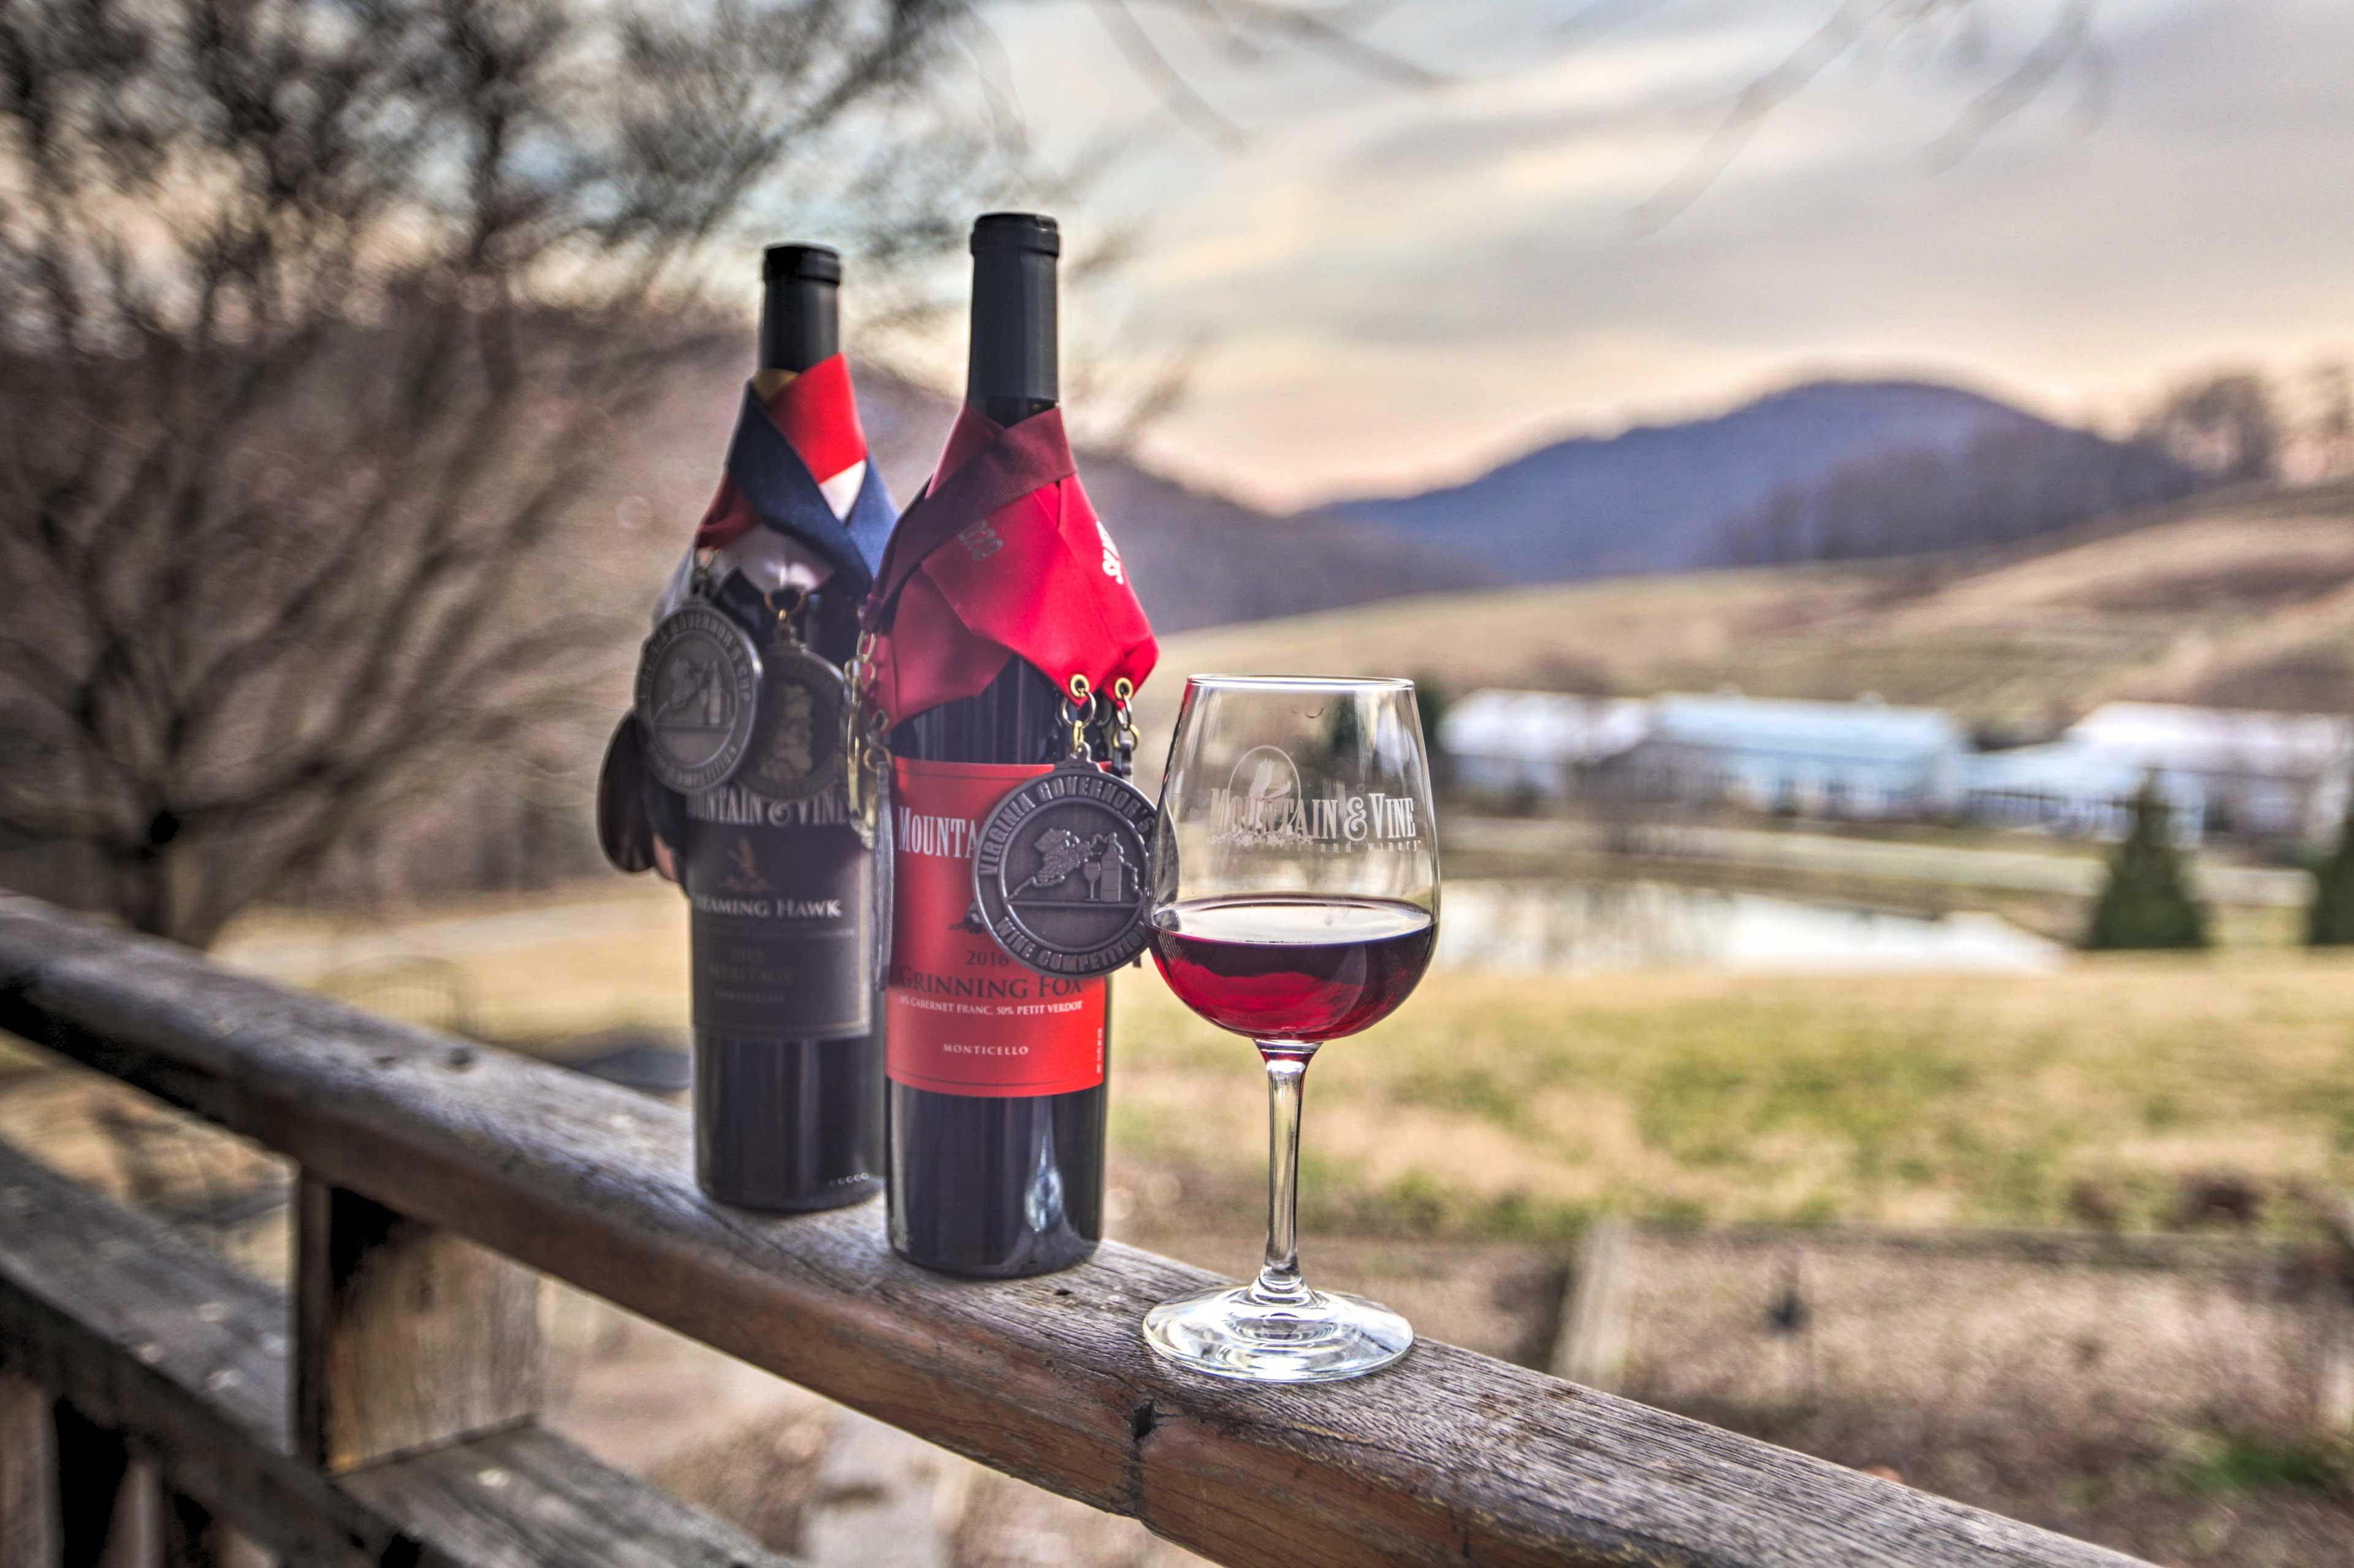 Delfosse Vineyards & Winery